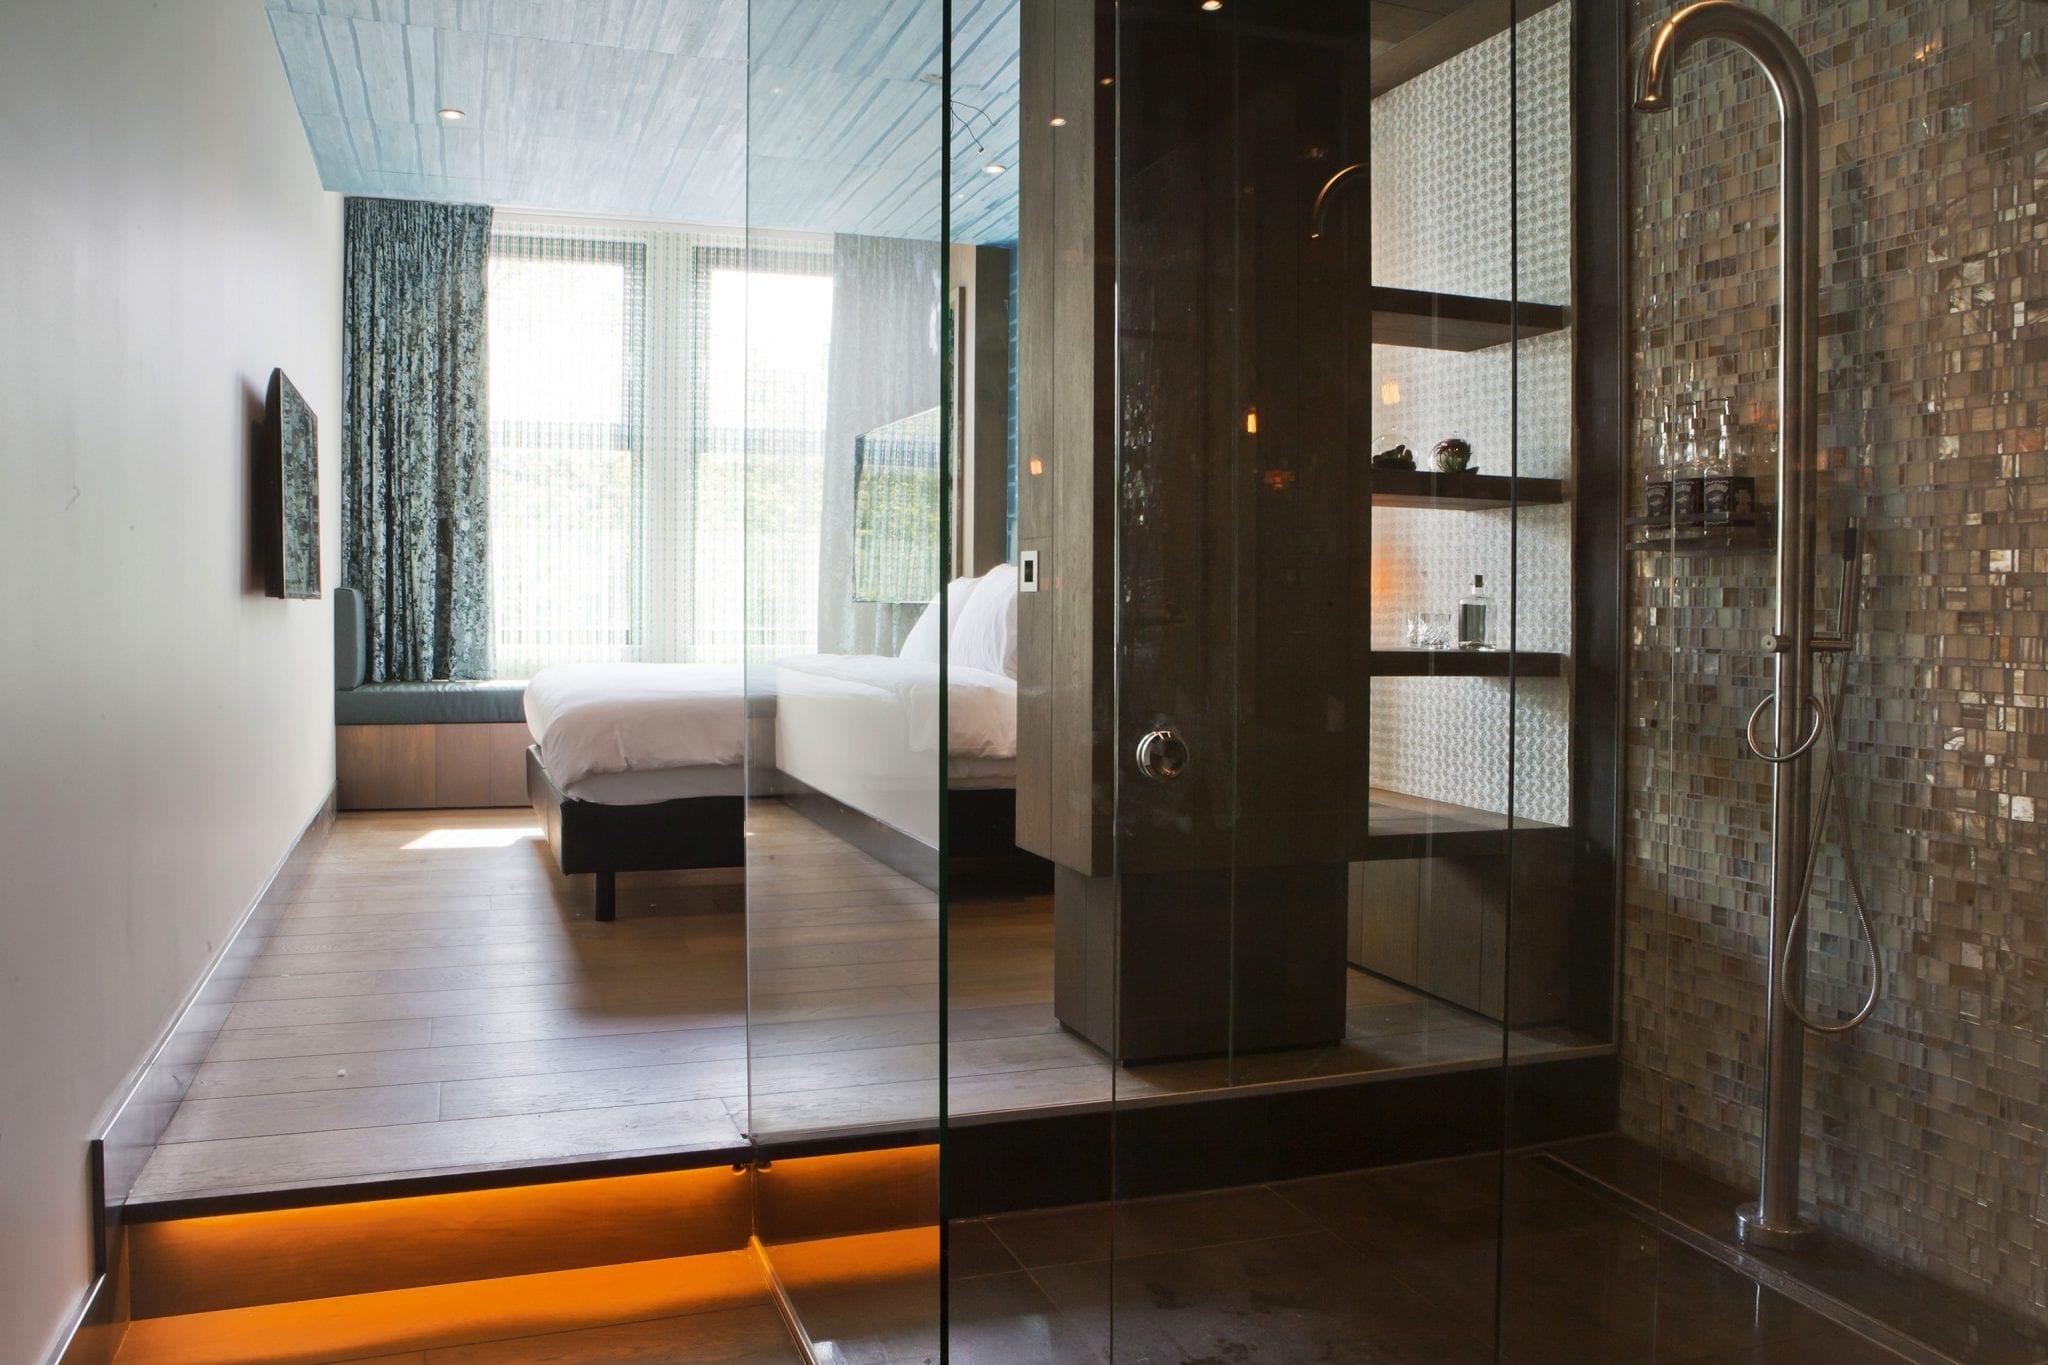 Manzo's Suites Zaandam in Zaandam, Netherlands